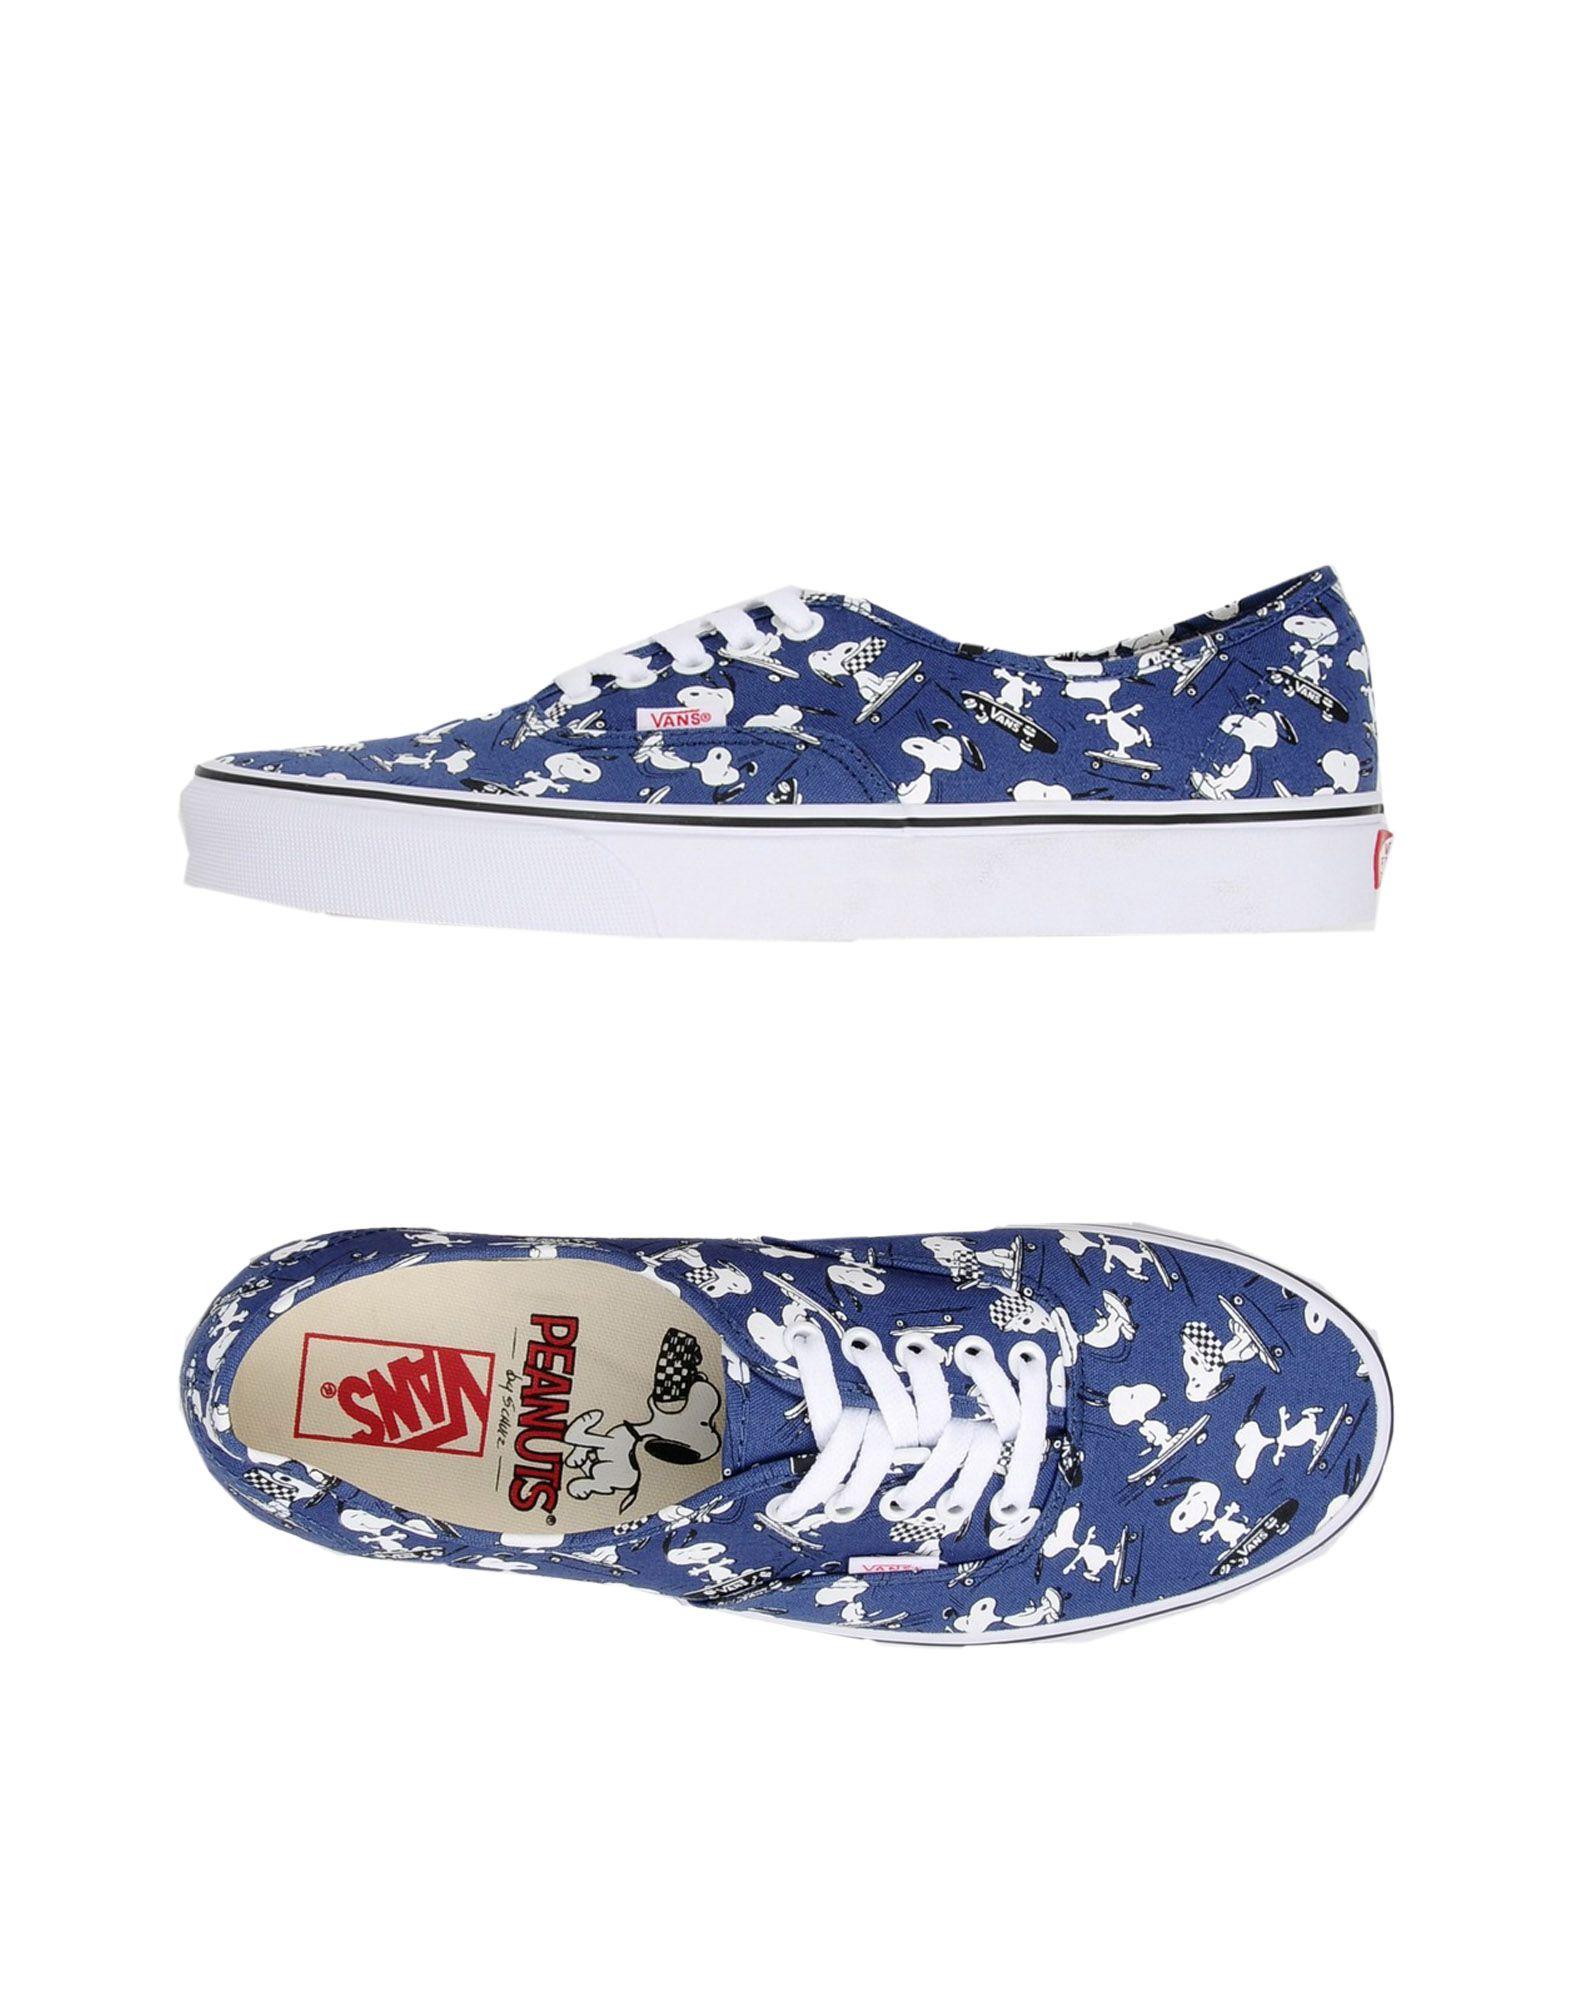 Sneakers Vans Ua Authentic Peanuts Snoopy - Uomo - 11291086AD